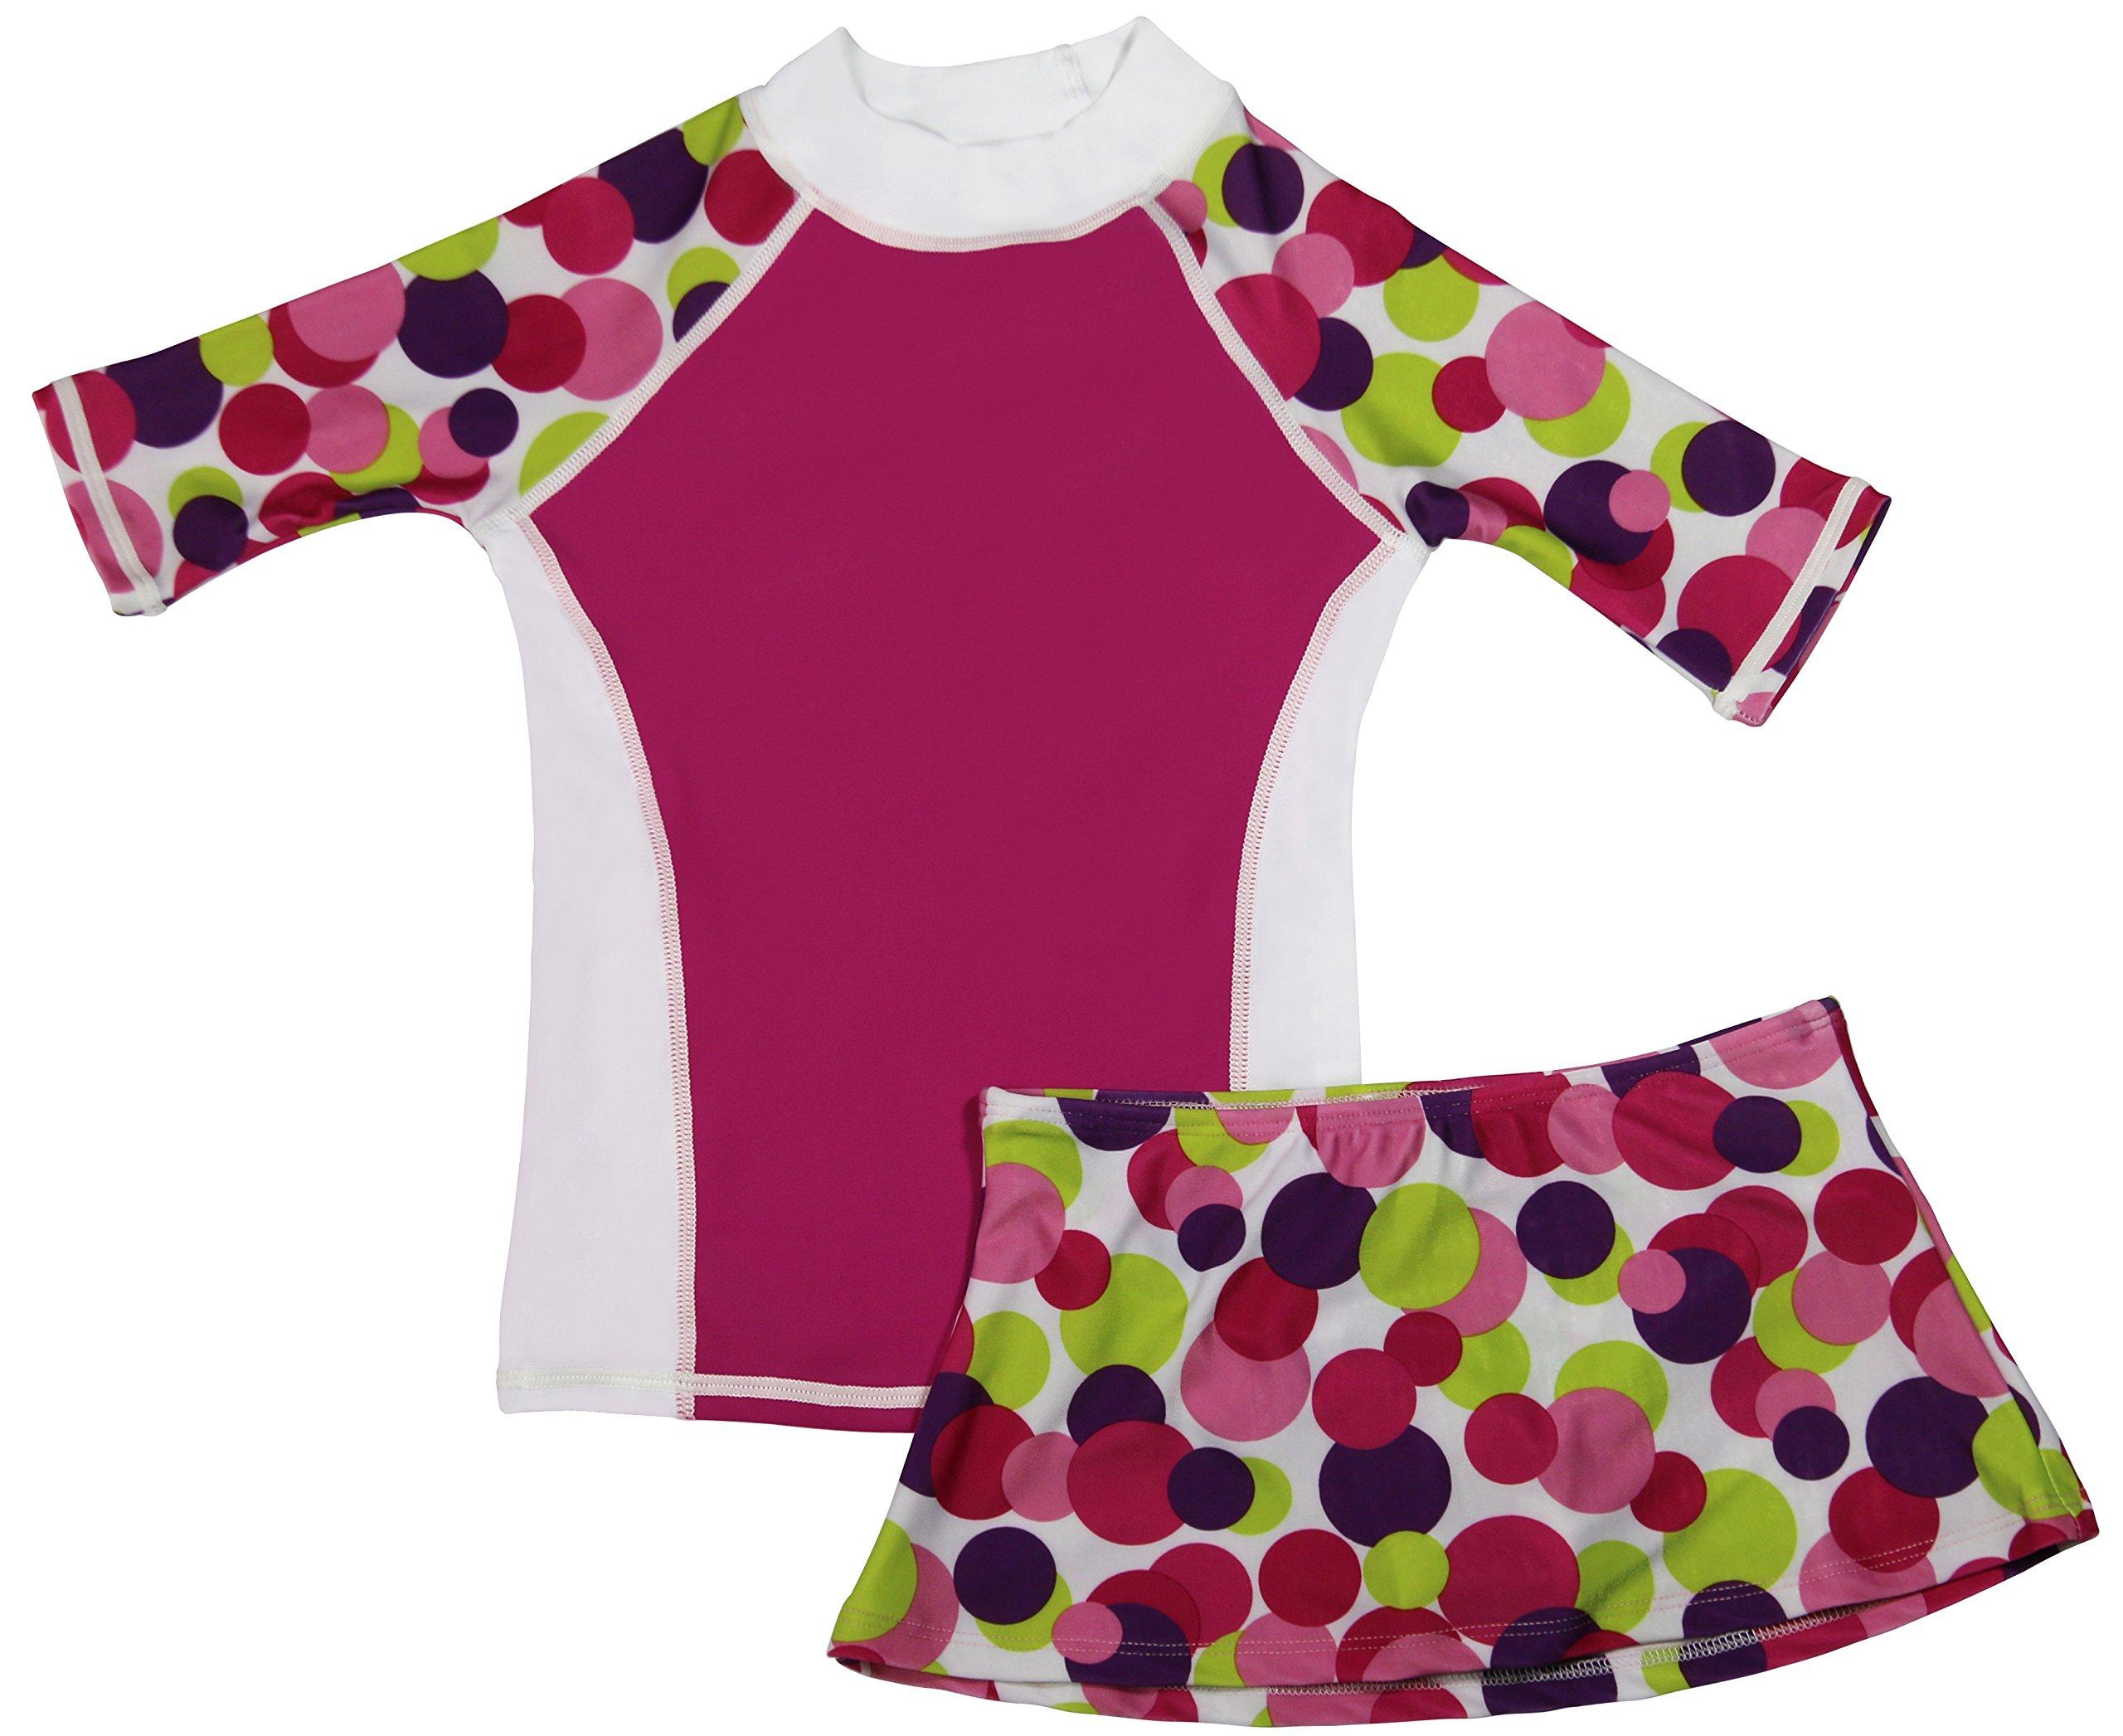 grUVywear Girls Short Sleeve UPF 50+ Rash Guard and Bikini Skirt Swimsuit Set - A Dot to Love | 7-8 by grUVywear